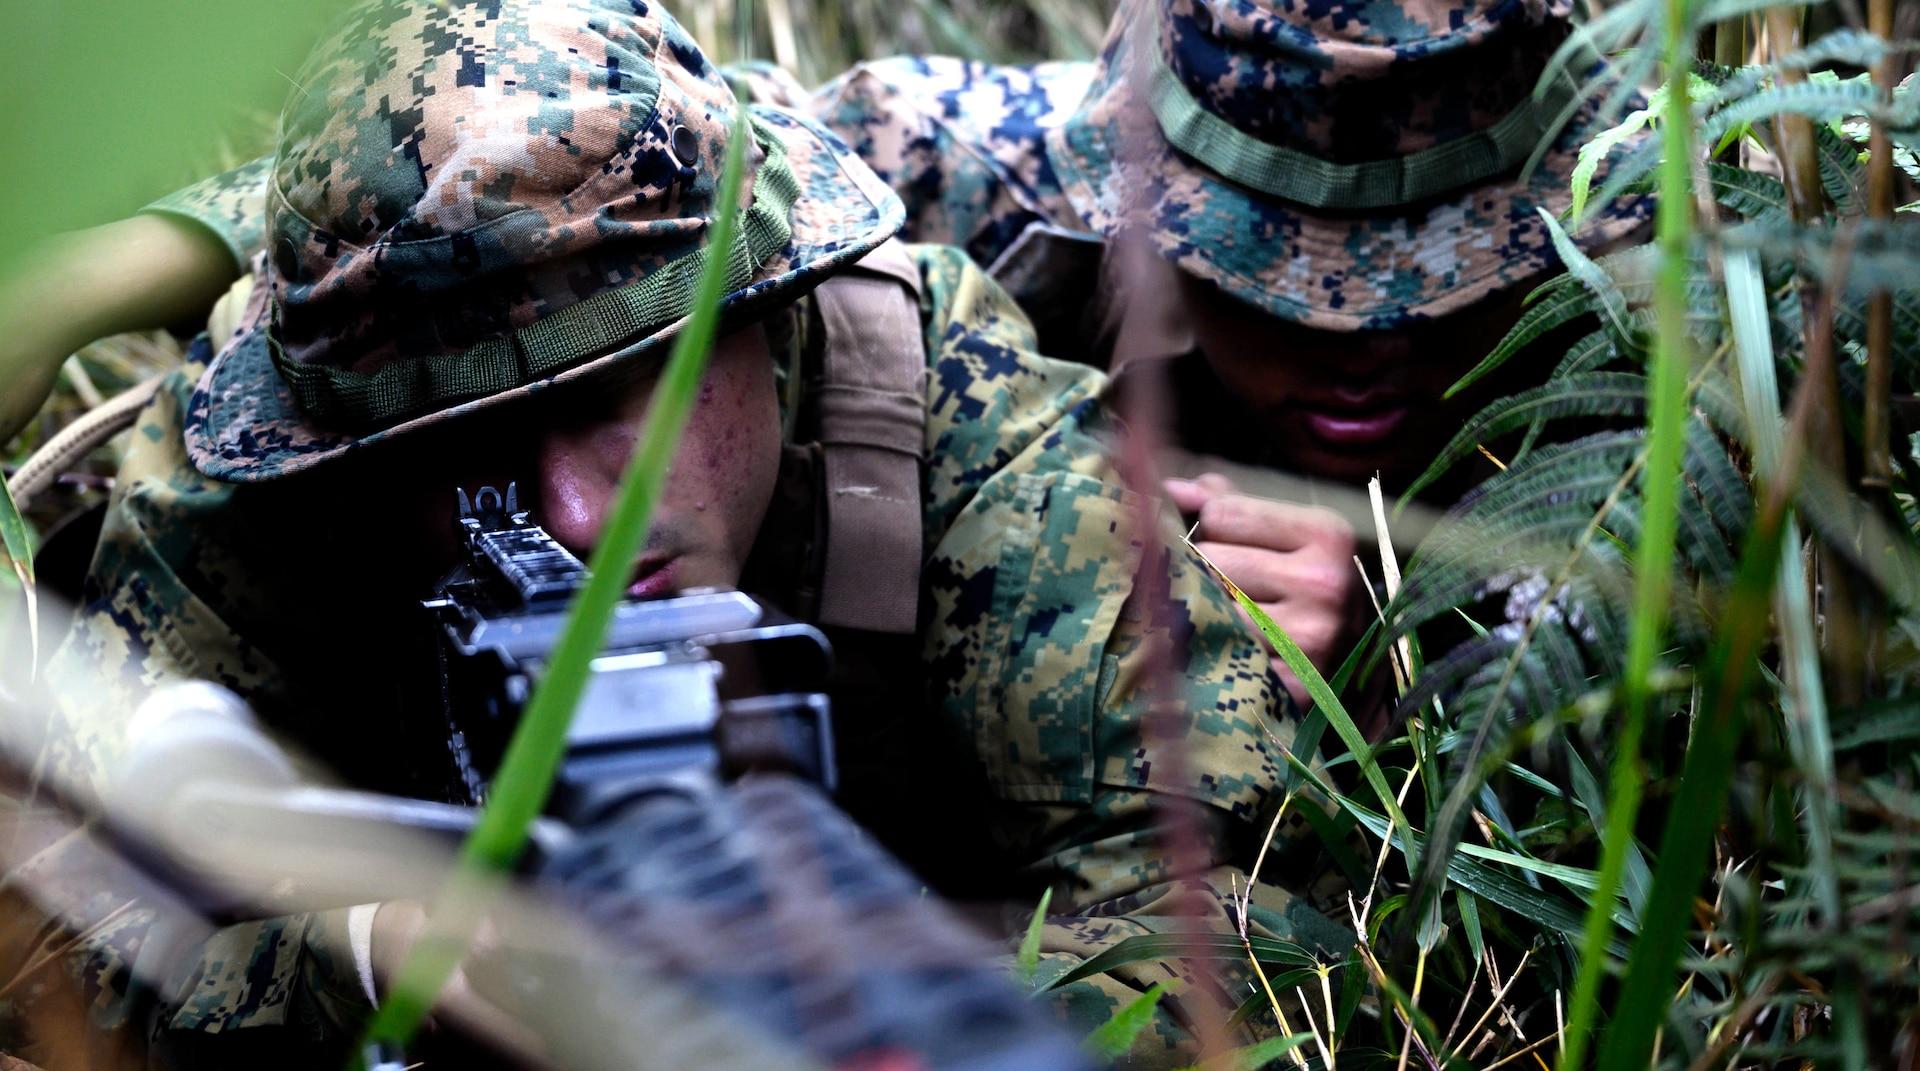 Marines with Headquarters Battalion, 3rd Marine Division, provide security for convoy during Samurai 2-20 on Camp Hansen, Okinawa, Japan, December 10, 2019 (U.S. Marine Corps/Kallahan Morris)